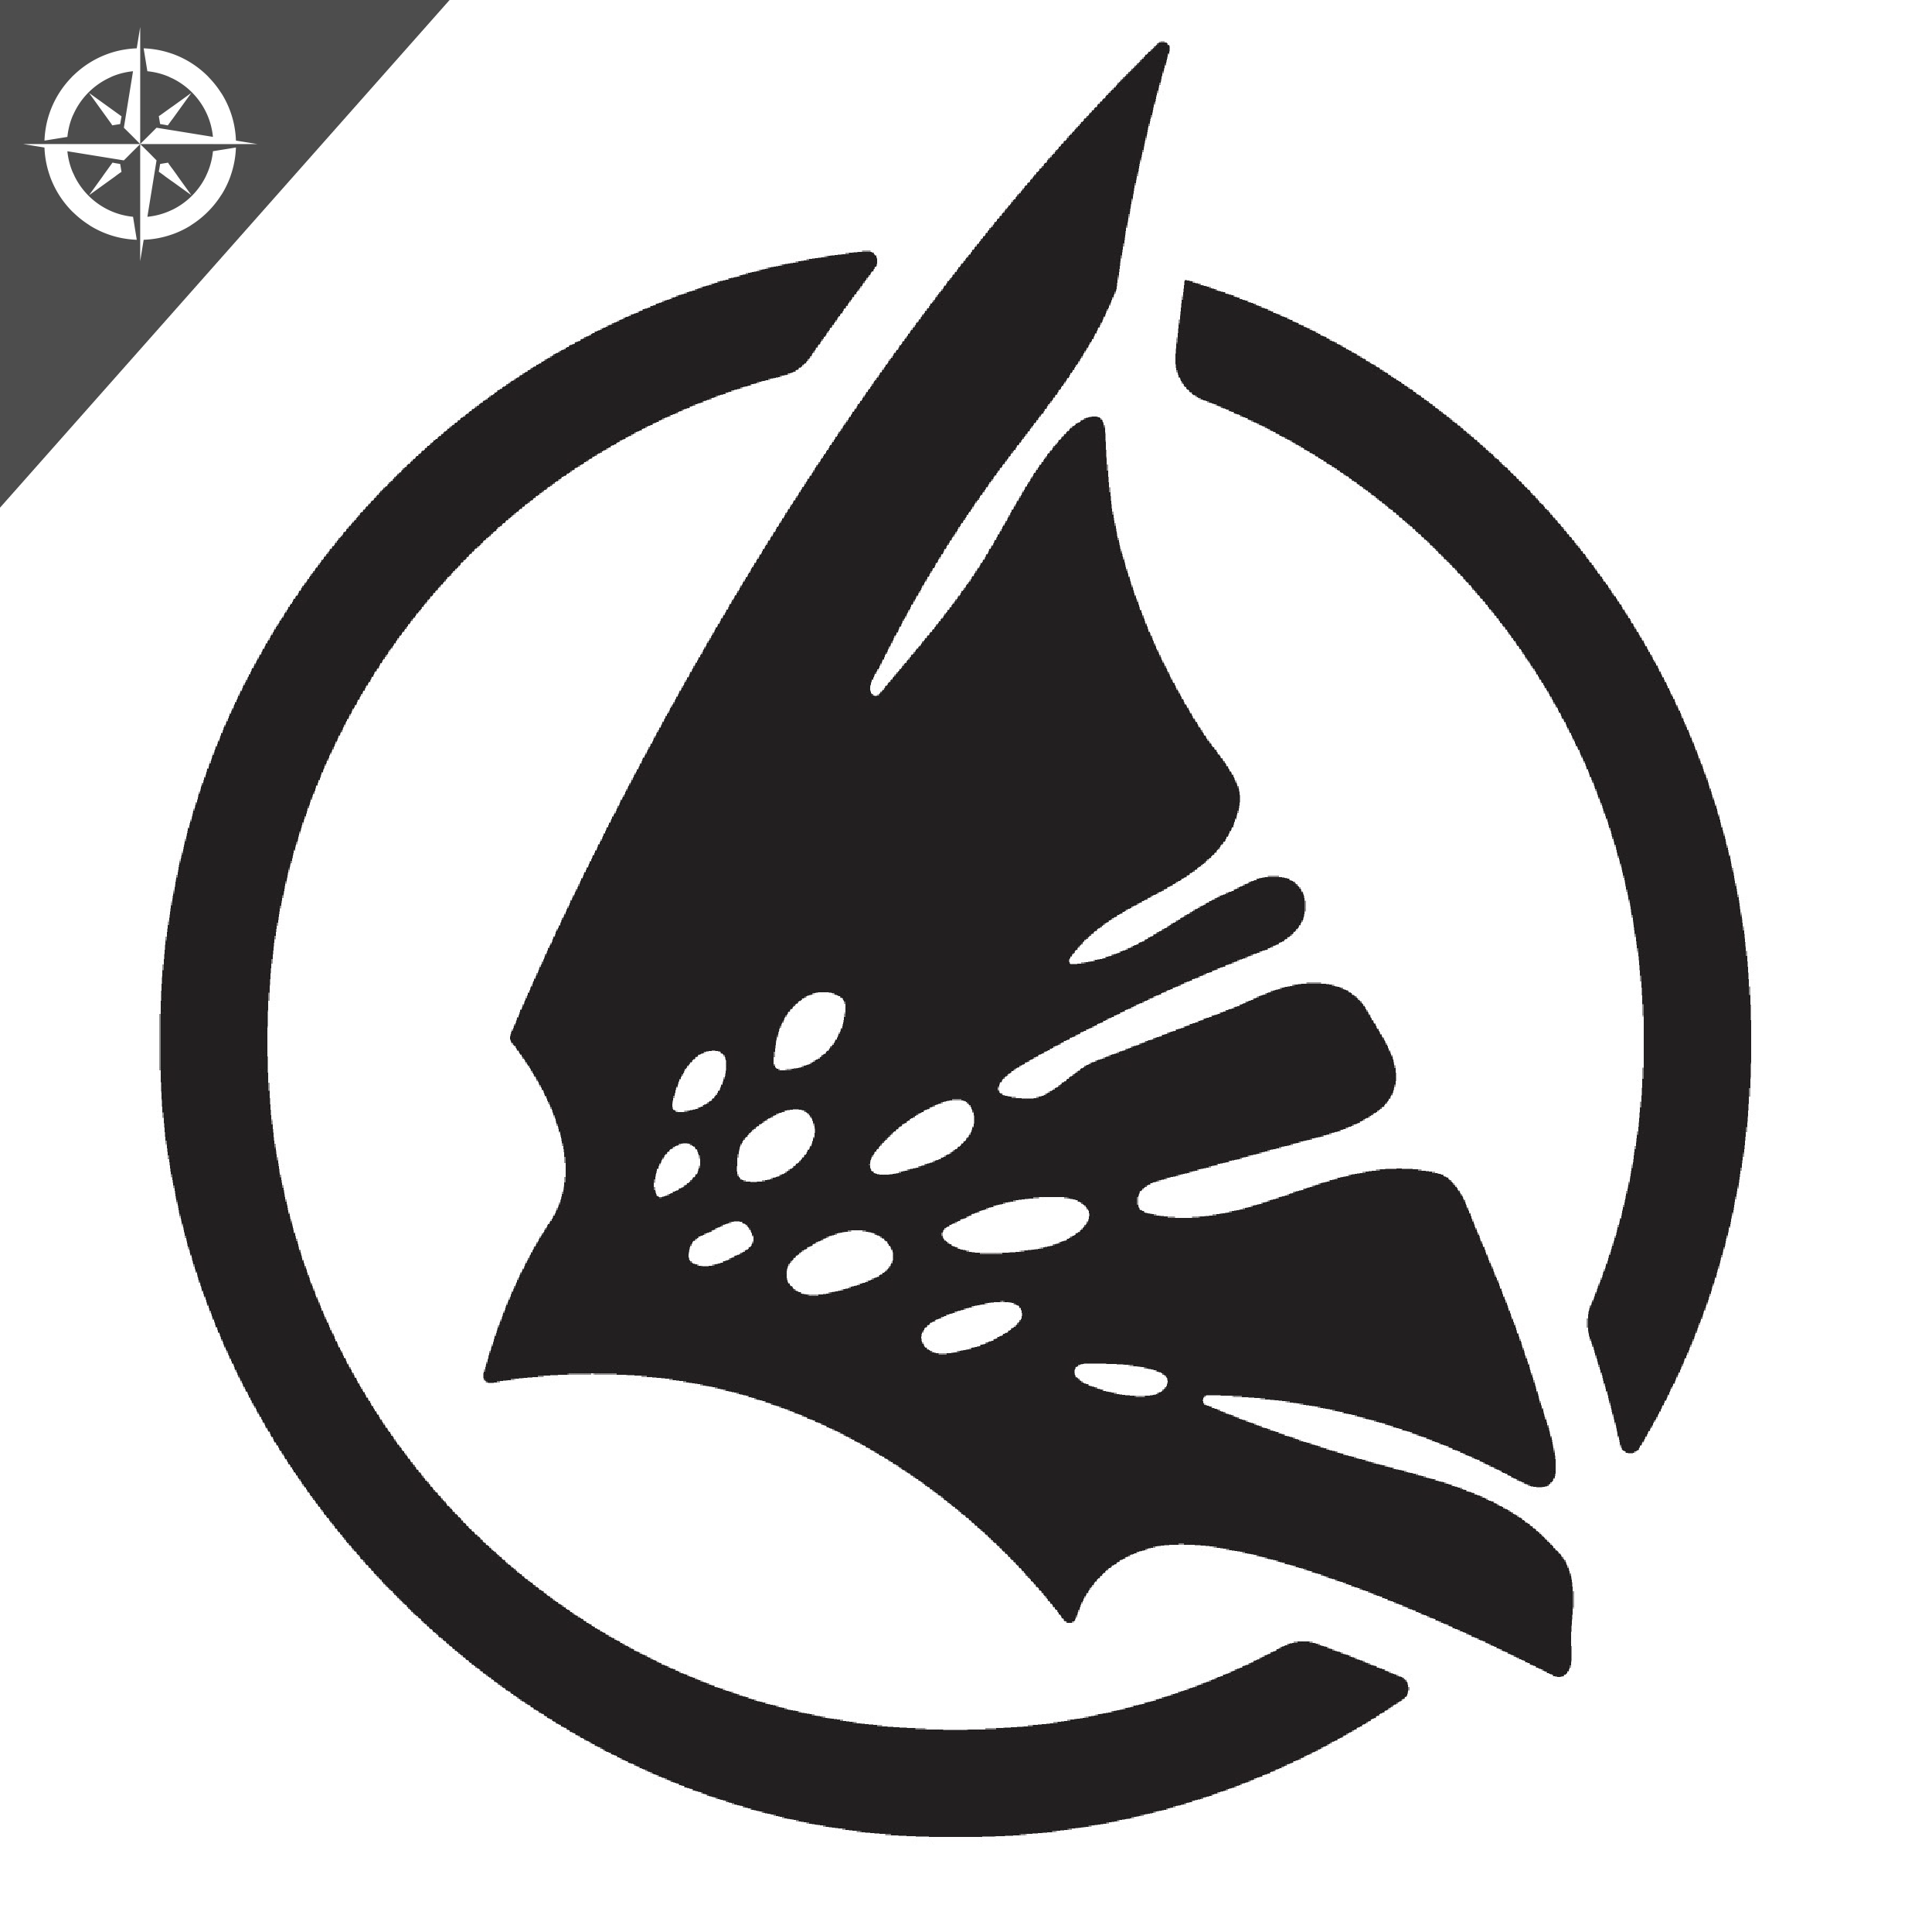 WOC-FlyShopCo-01.png